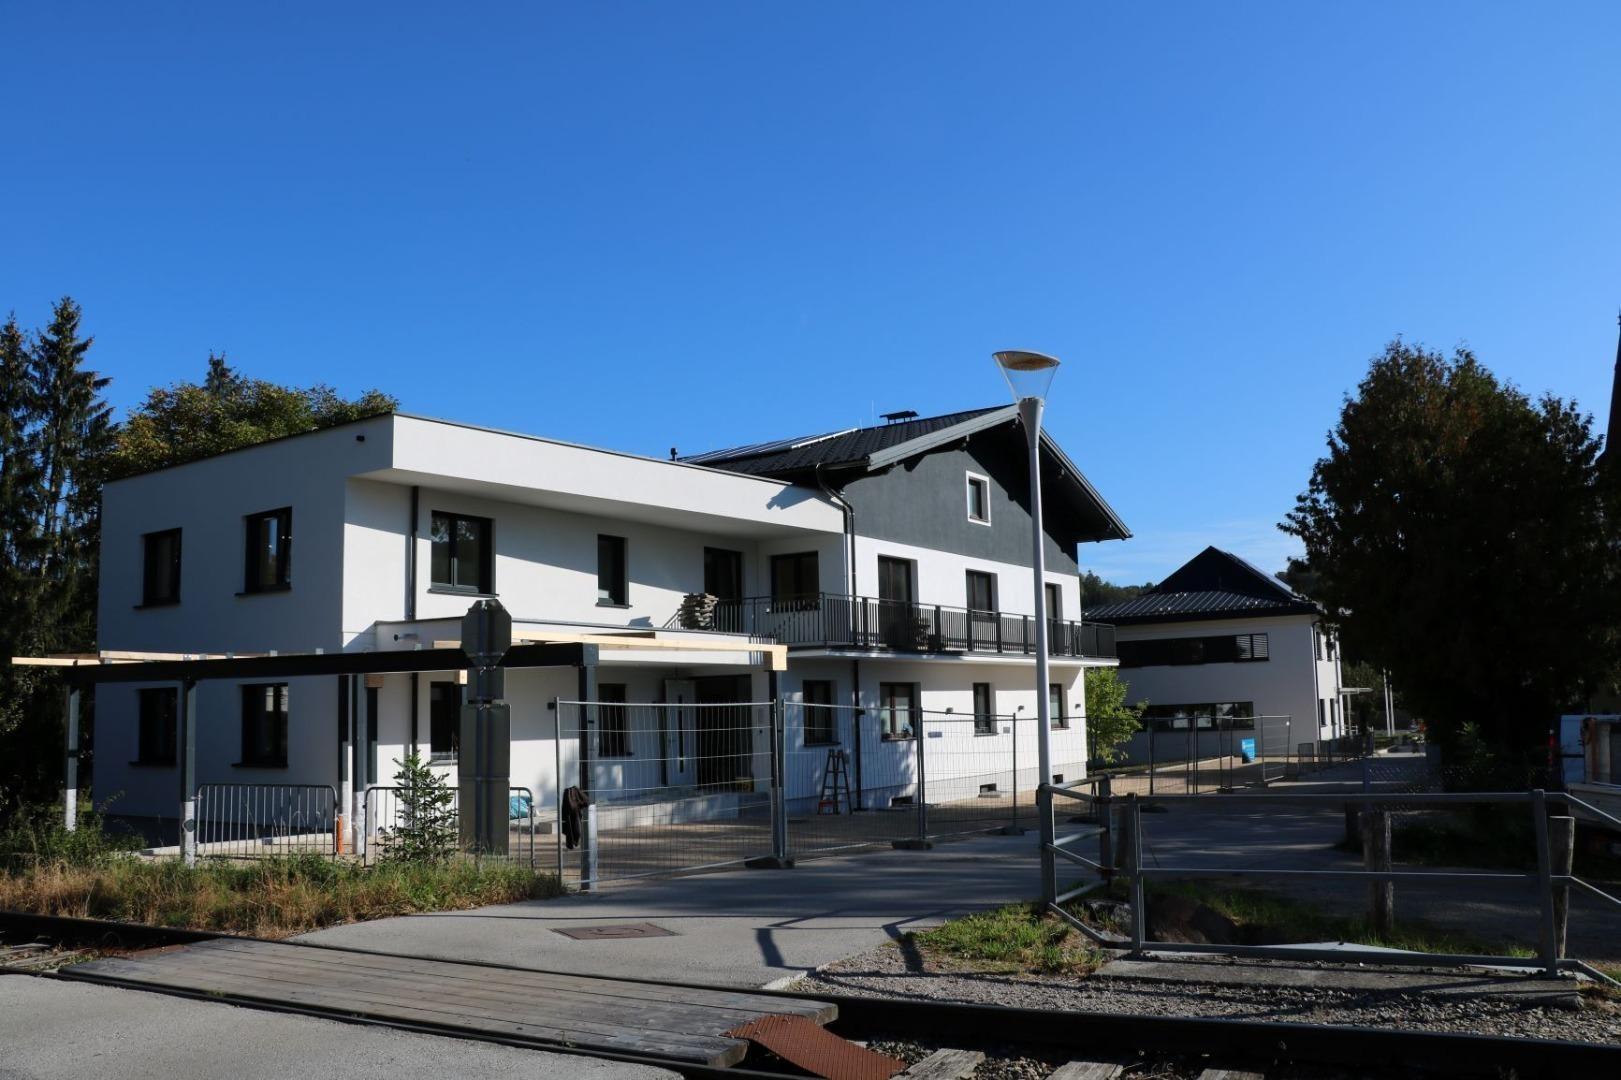 Arzthaus_Oktober.JPG